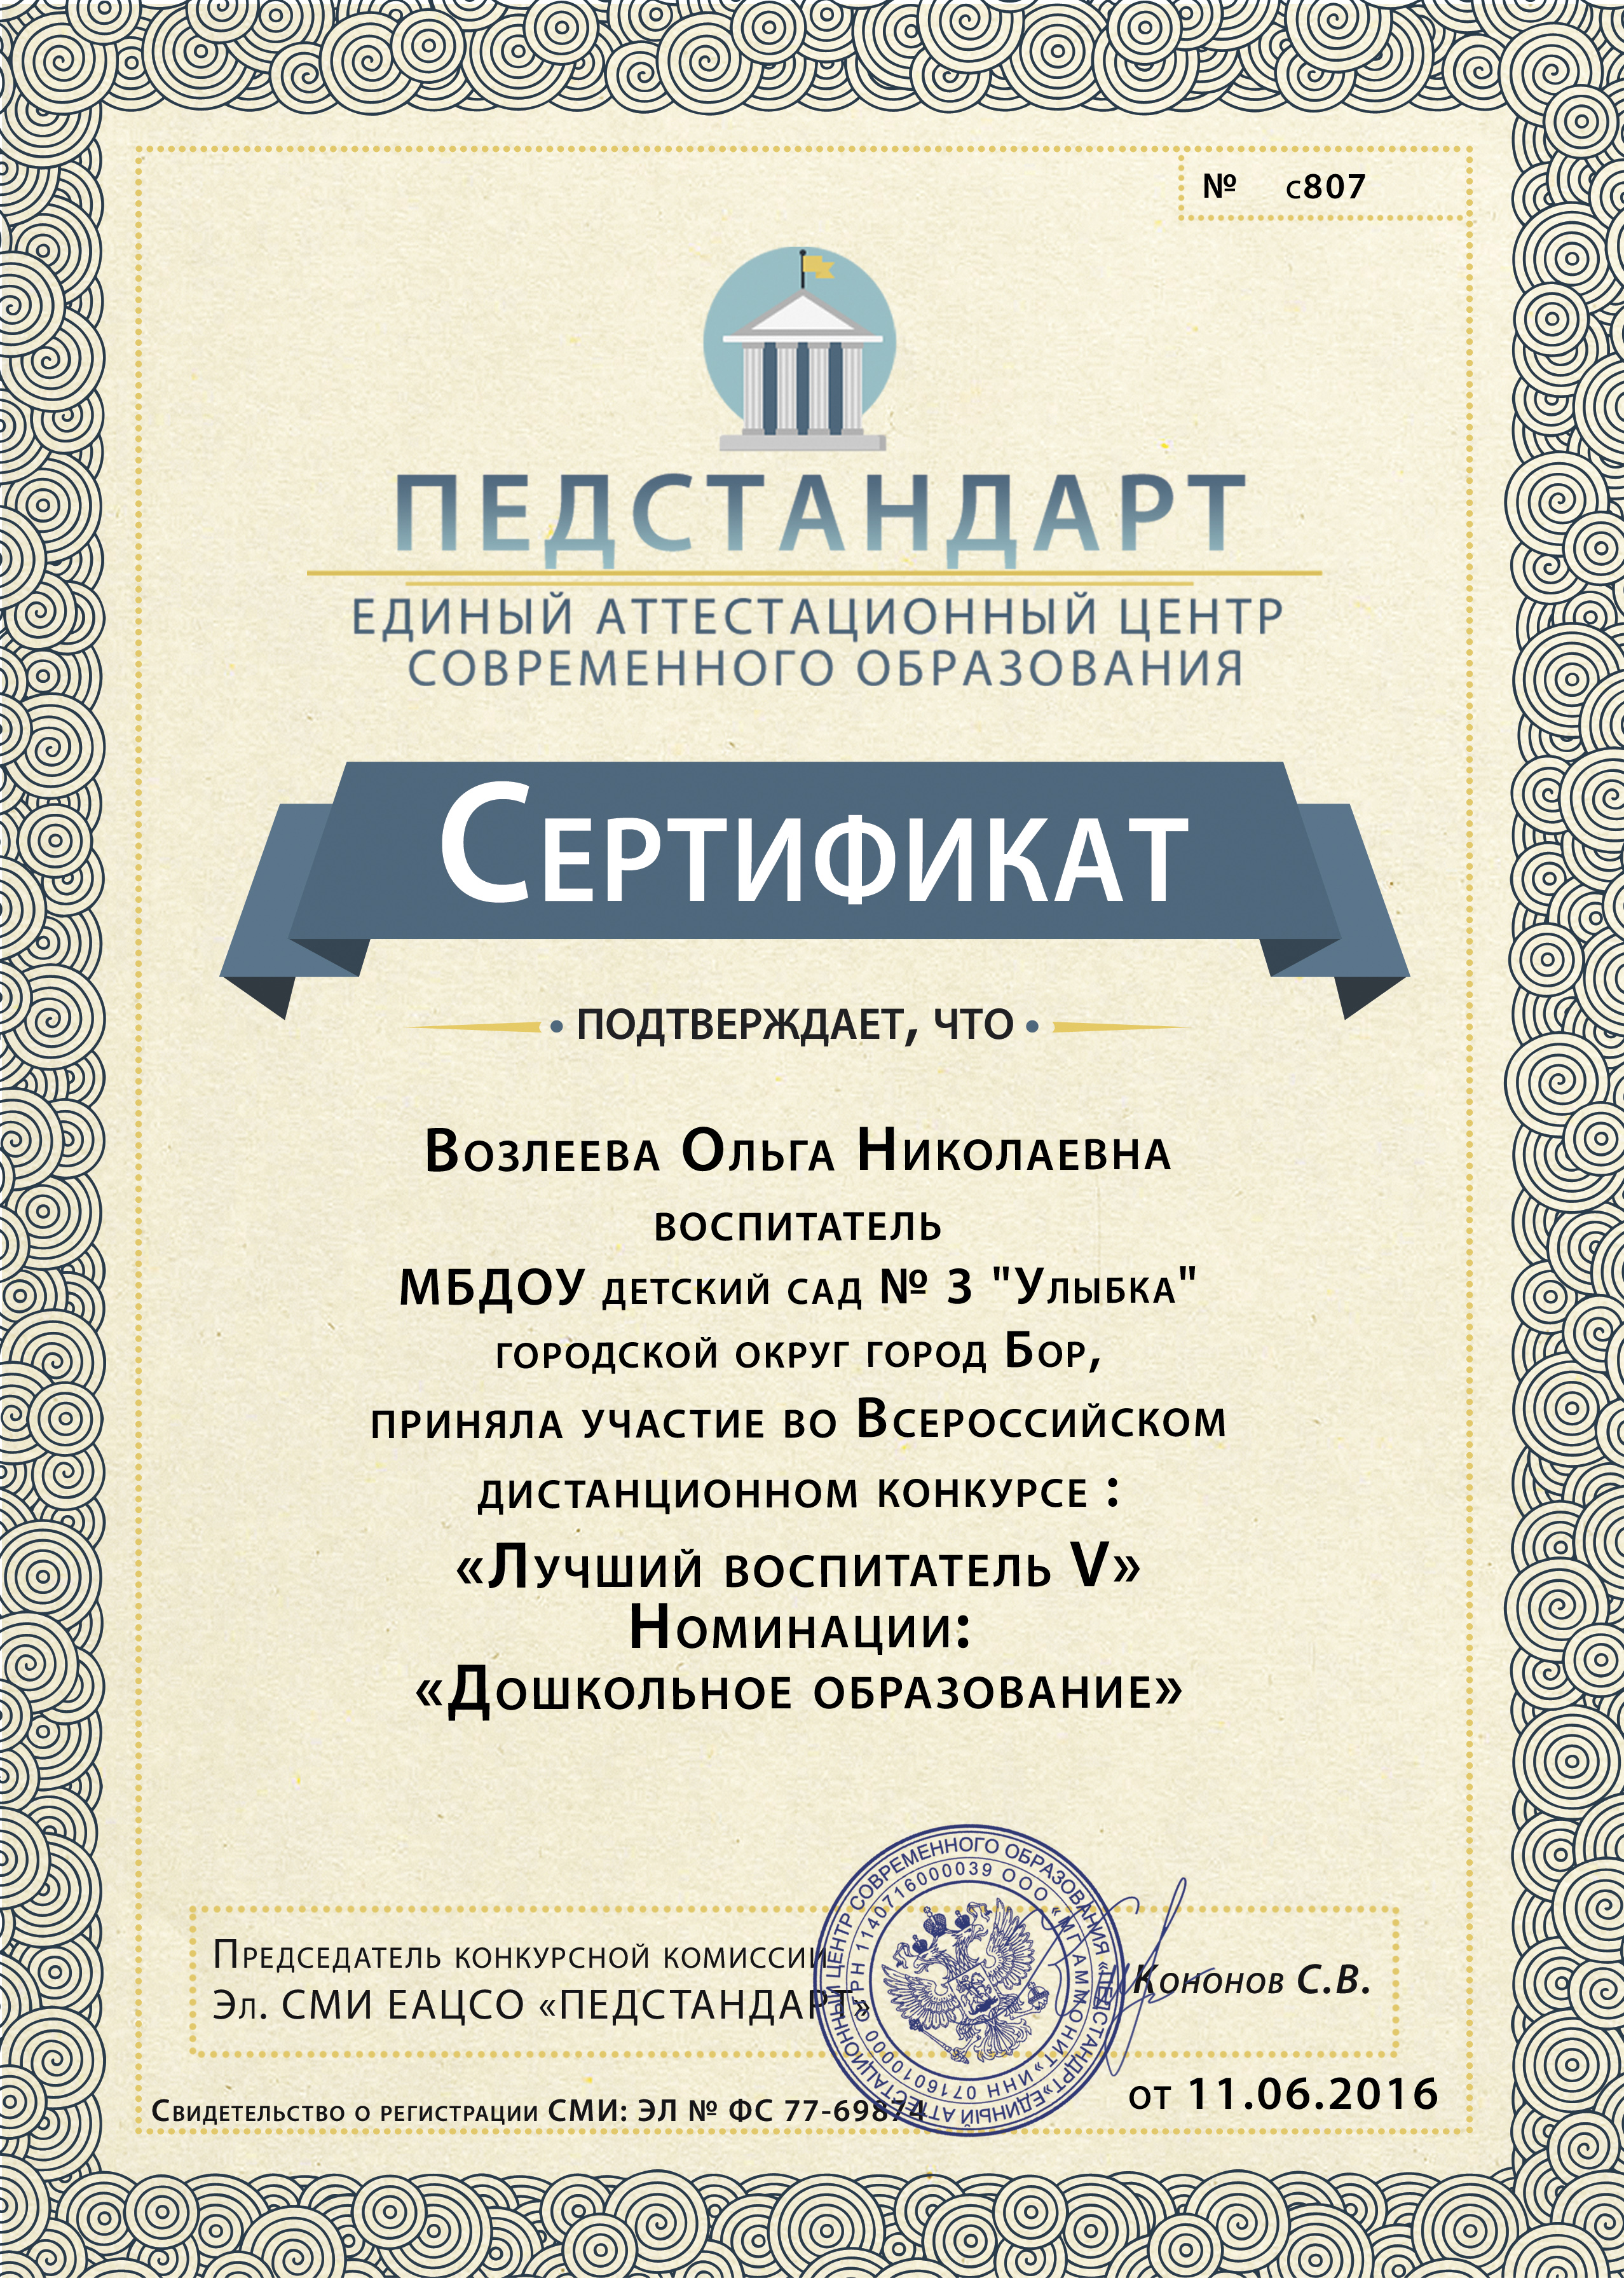 Сертификат-1.jpg